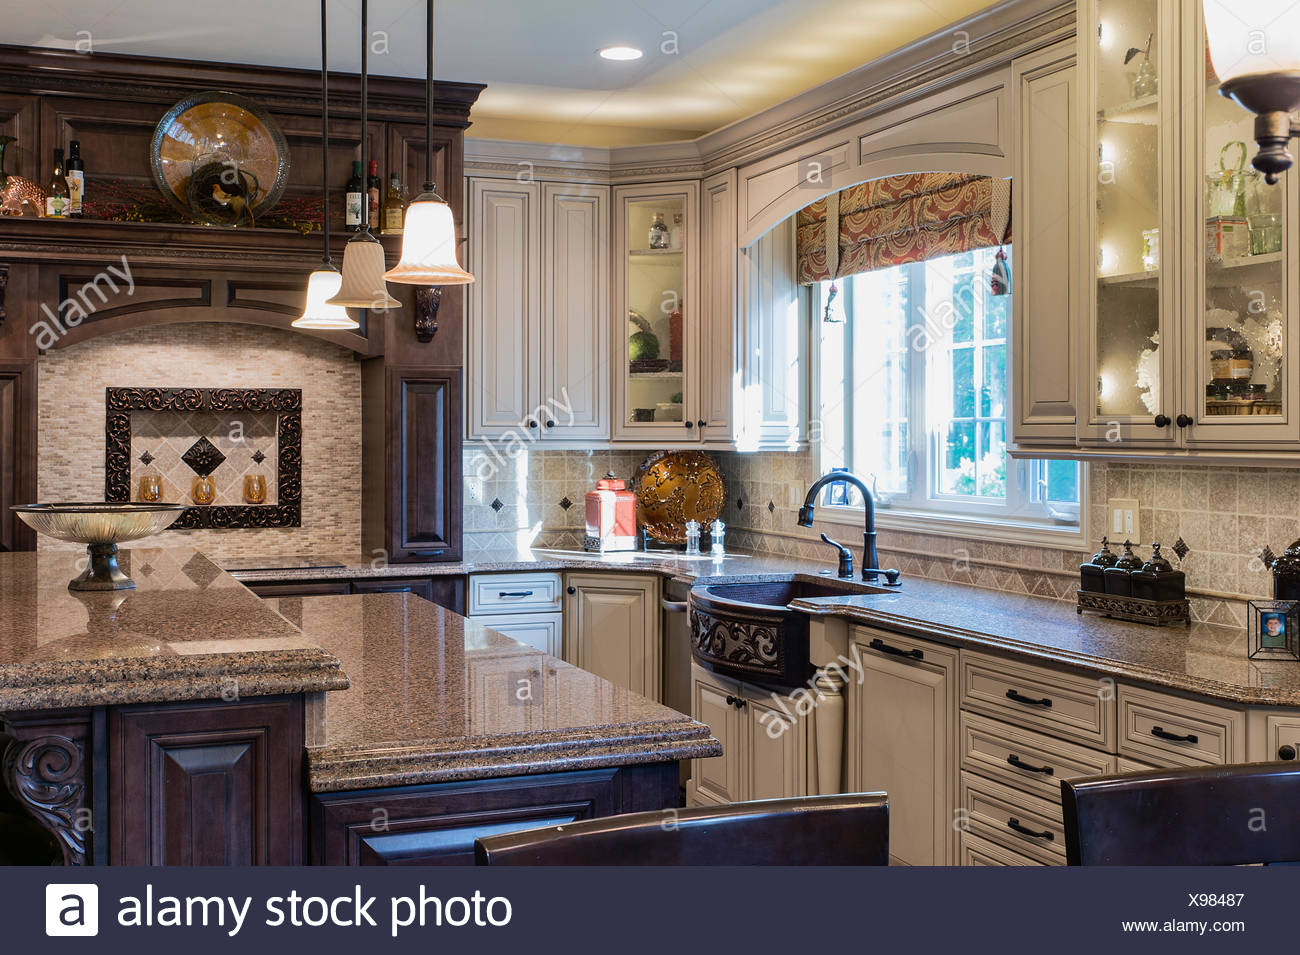 Cucina di lusso interior design foto immagine stock - Cucina di lusso ...